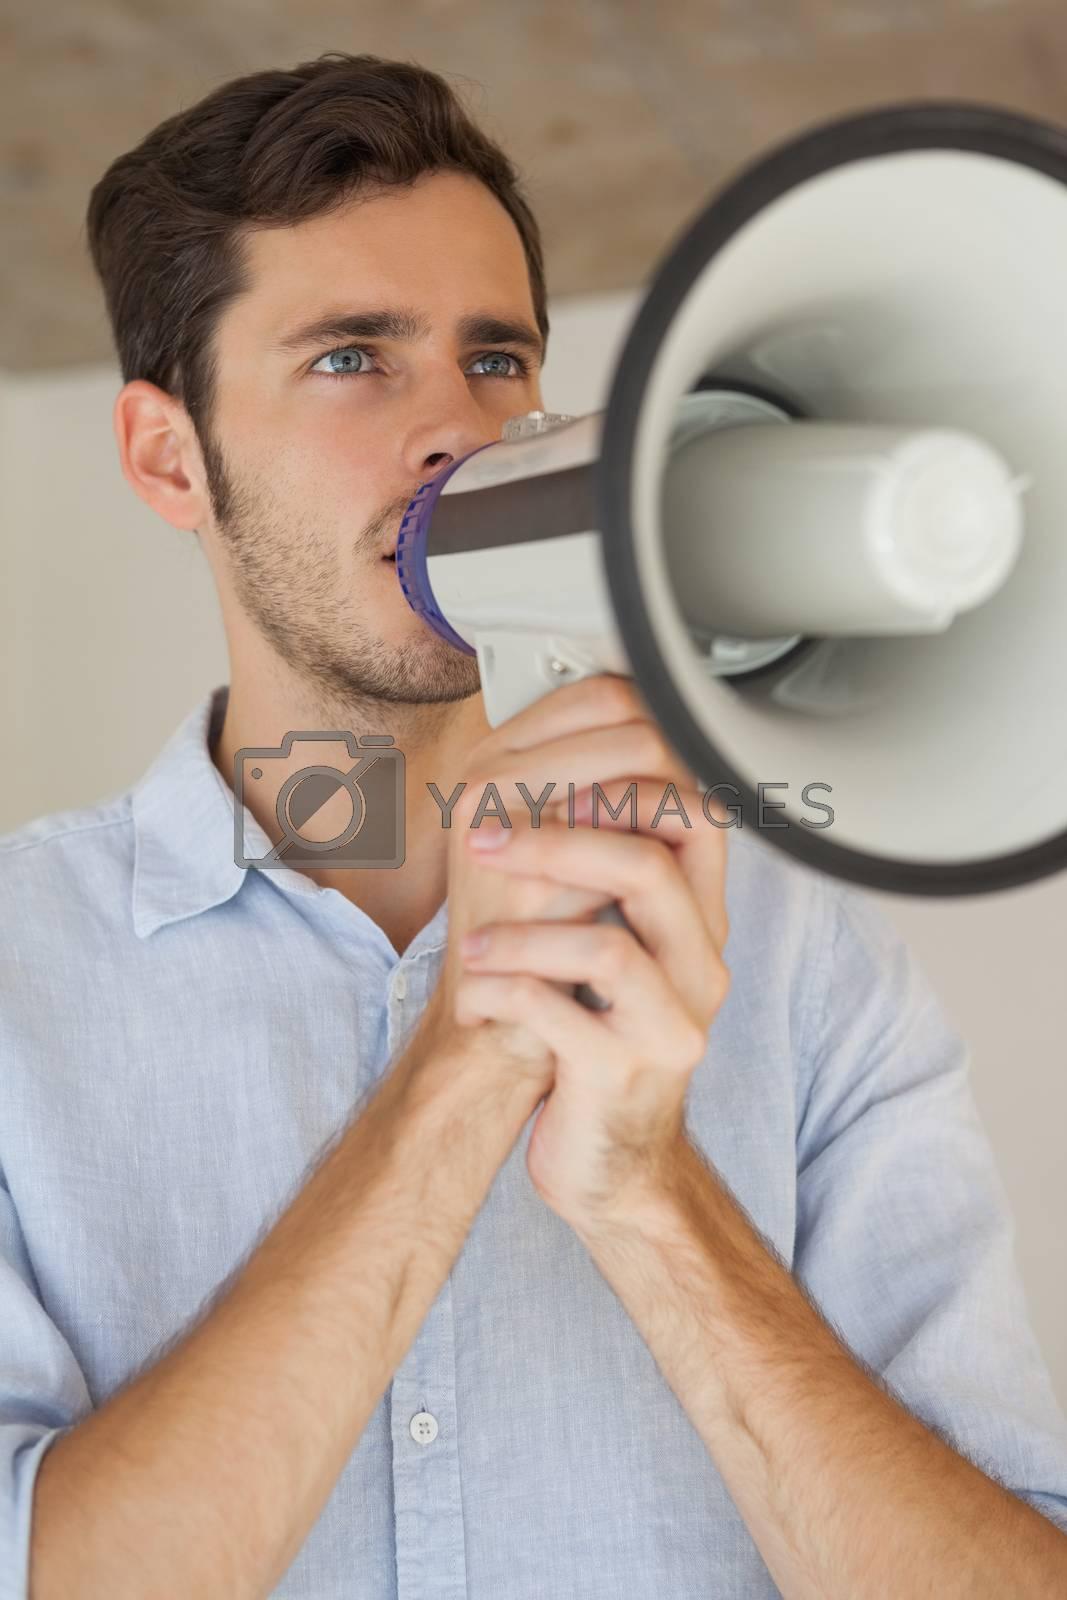 Royalty free image of Casual businessman talking through megaphone by Wavebreakmedia